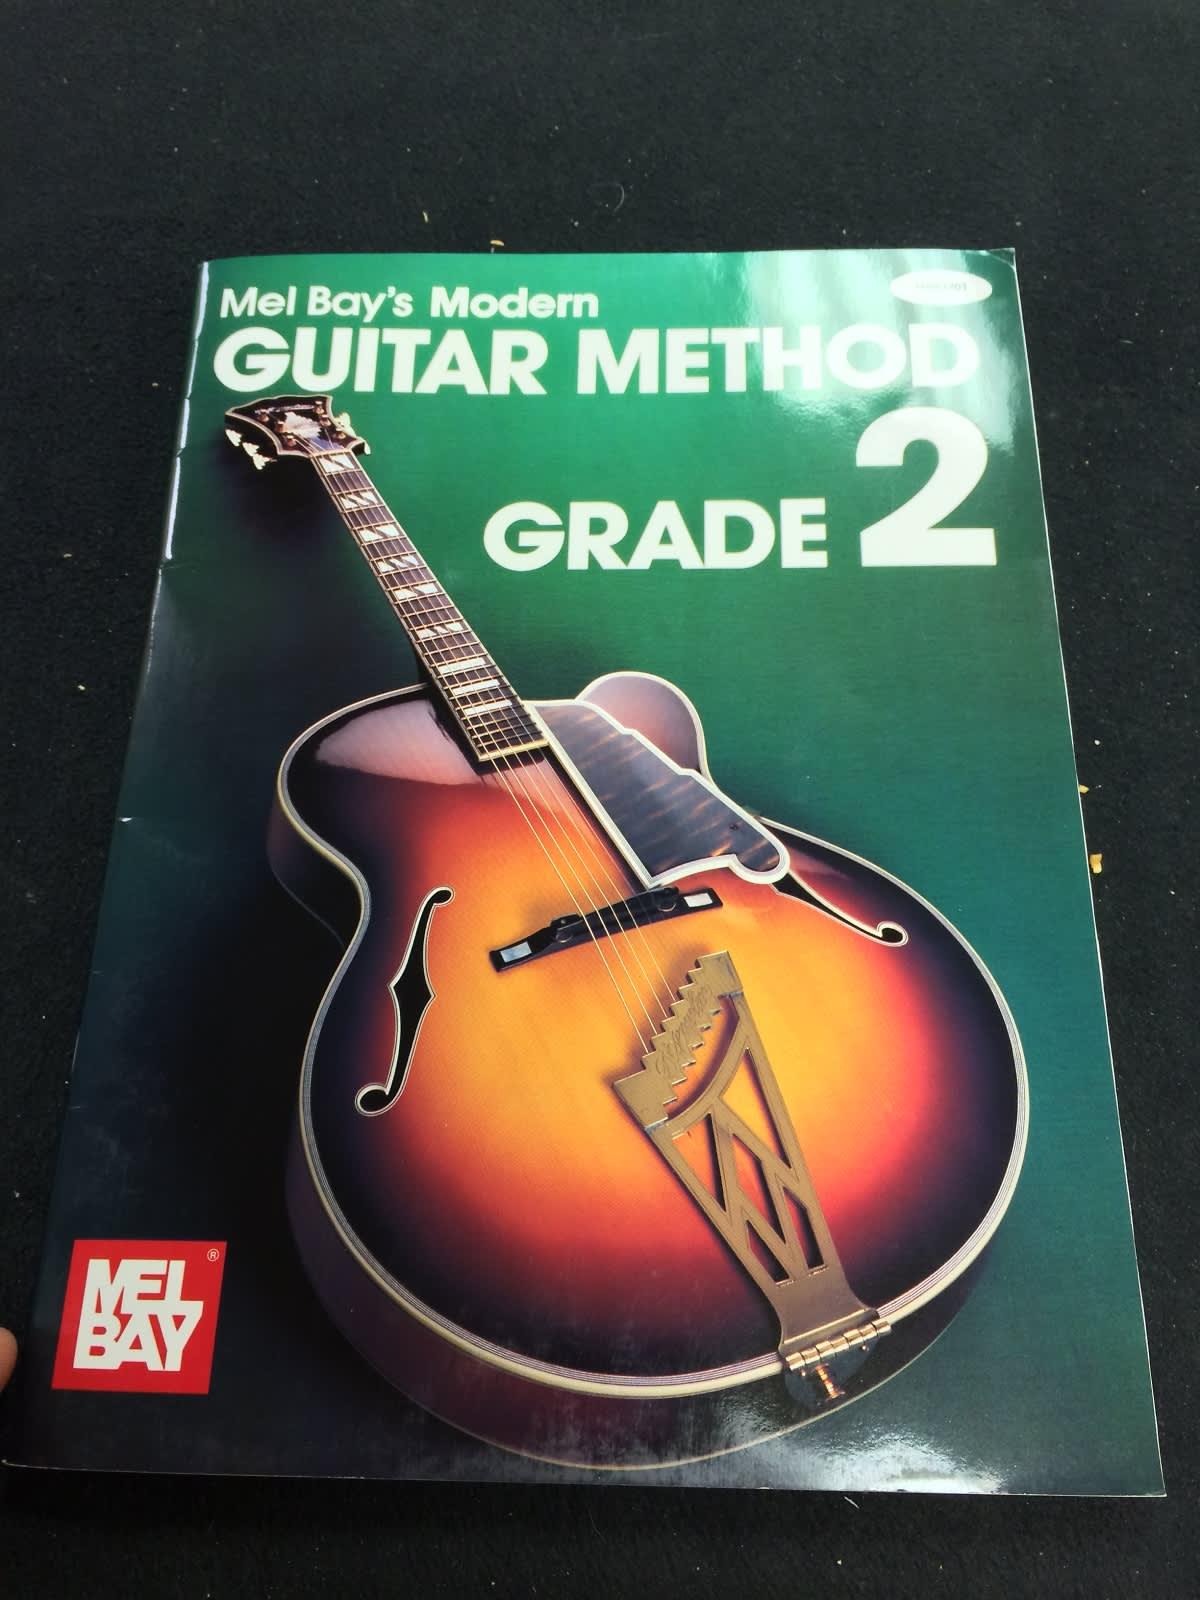 Mel Bay Modern Guitar Method Grad 2 | Reverb